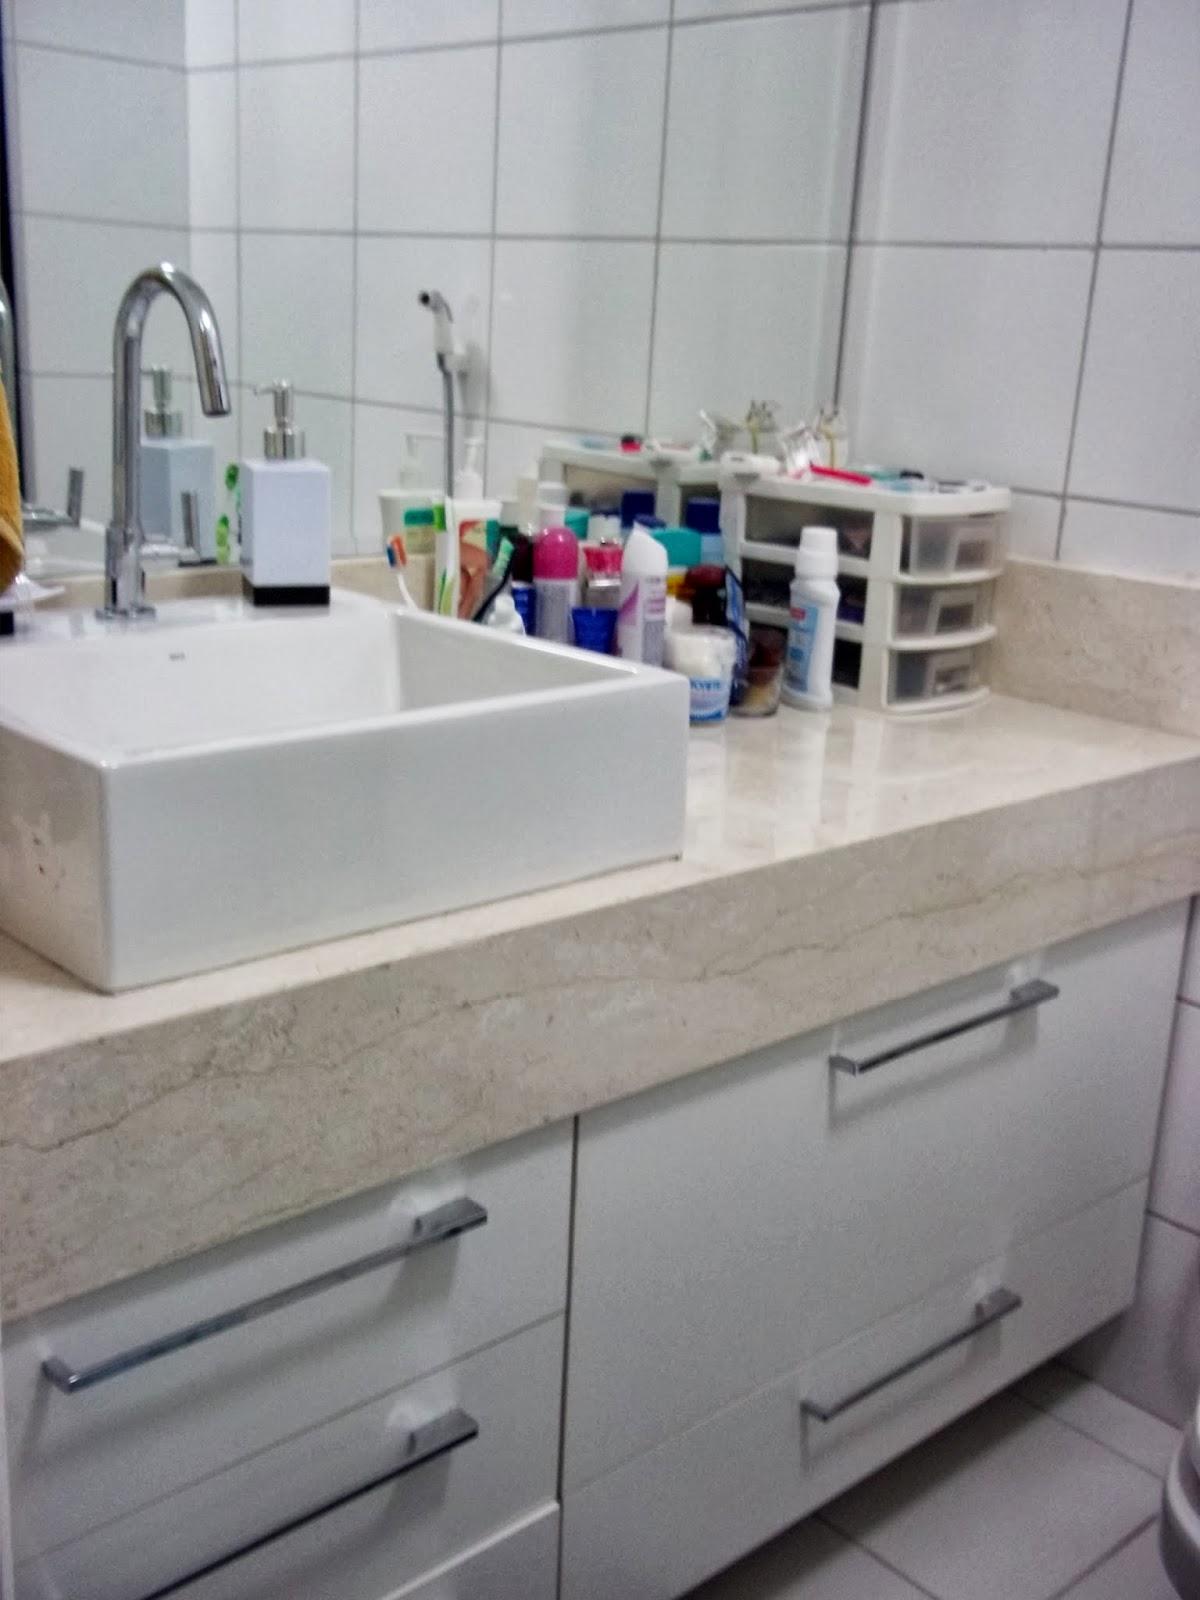 Banheiro do casal. Bancada em mármore travertino e cuba de apoio. #3C4261 1200x1600 Bancada Banheiro Marmore Travertino